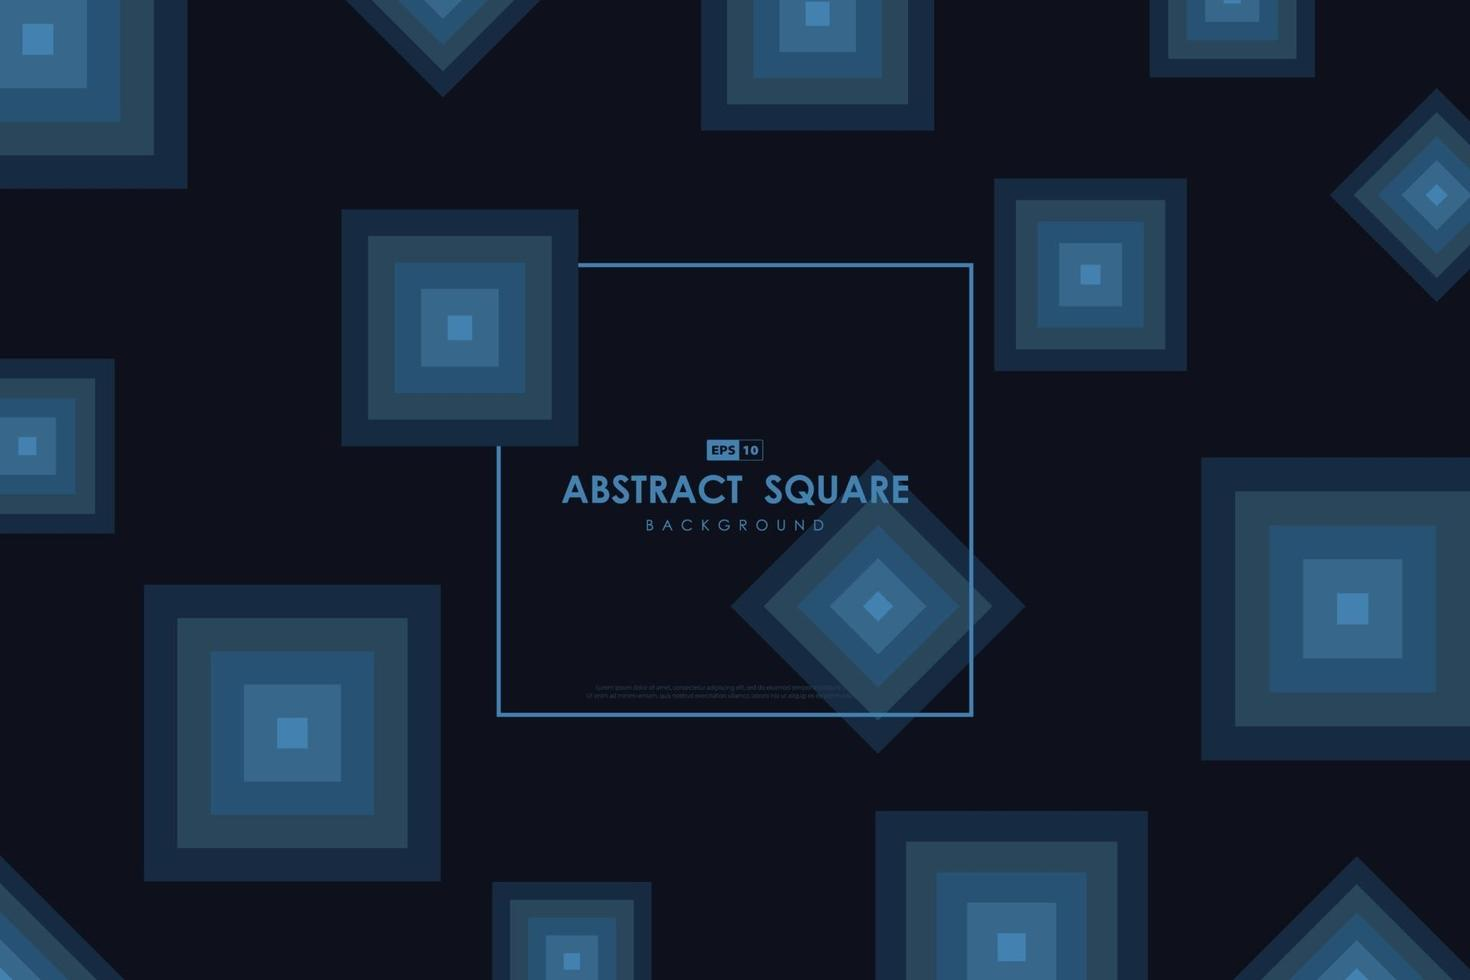 abstracte blauwe minimale vierkante patroon kunstwerk posterontwerp achtergrond. illustratie vector eps10